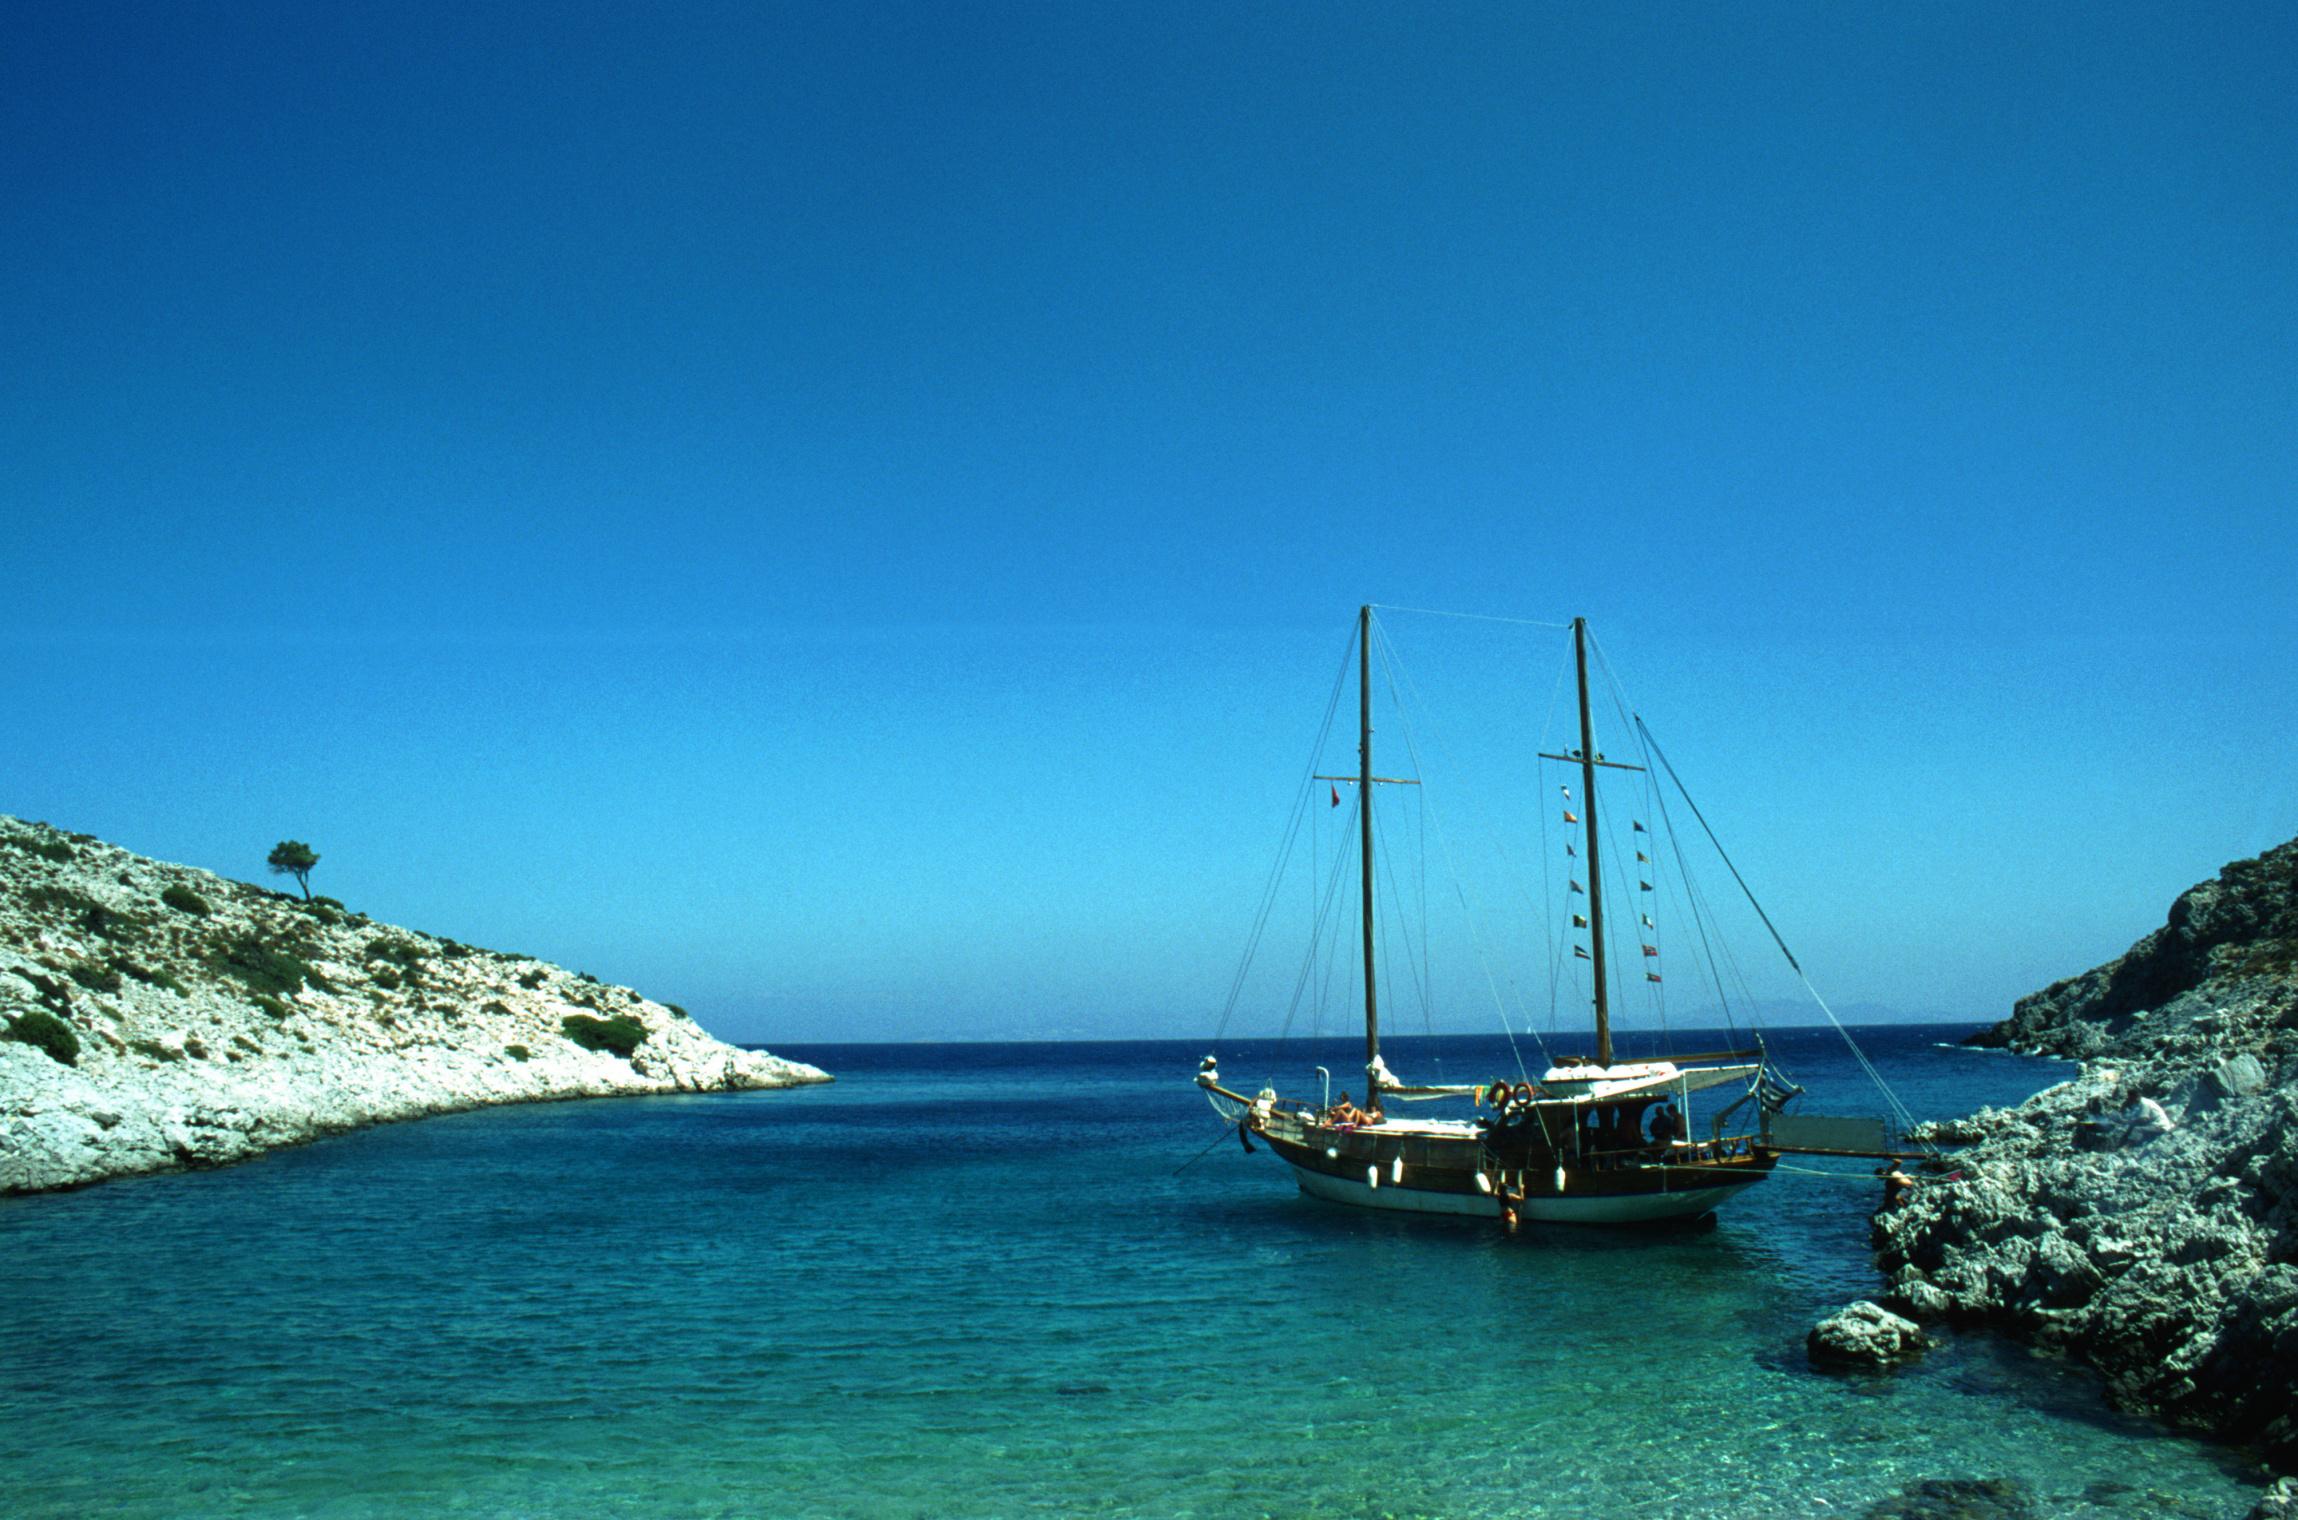 Sailing in the Greek Isles, Greece